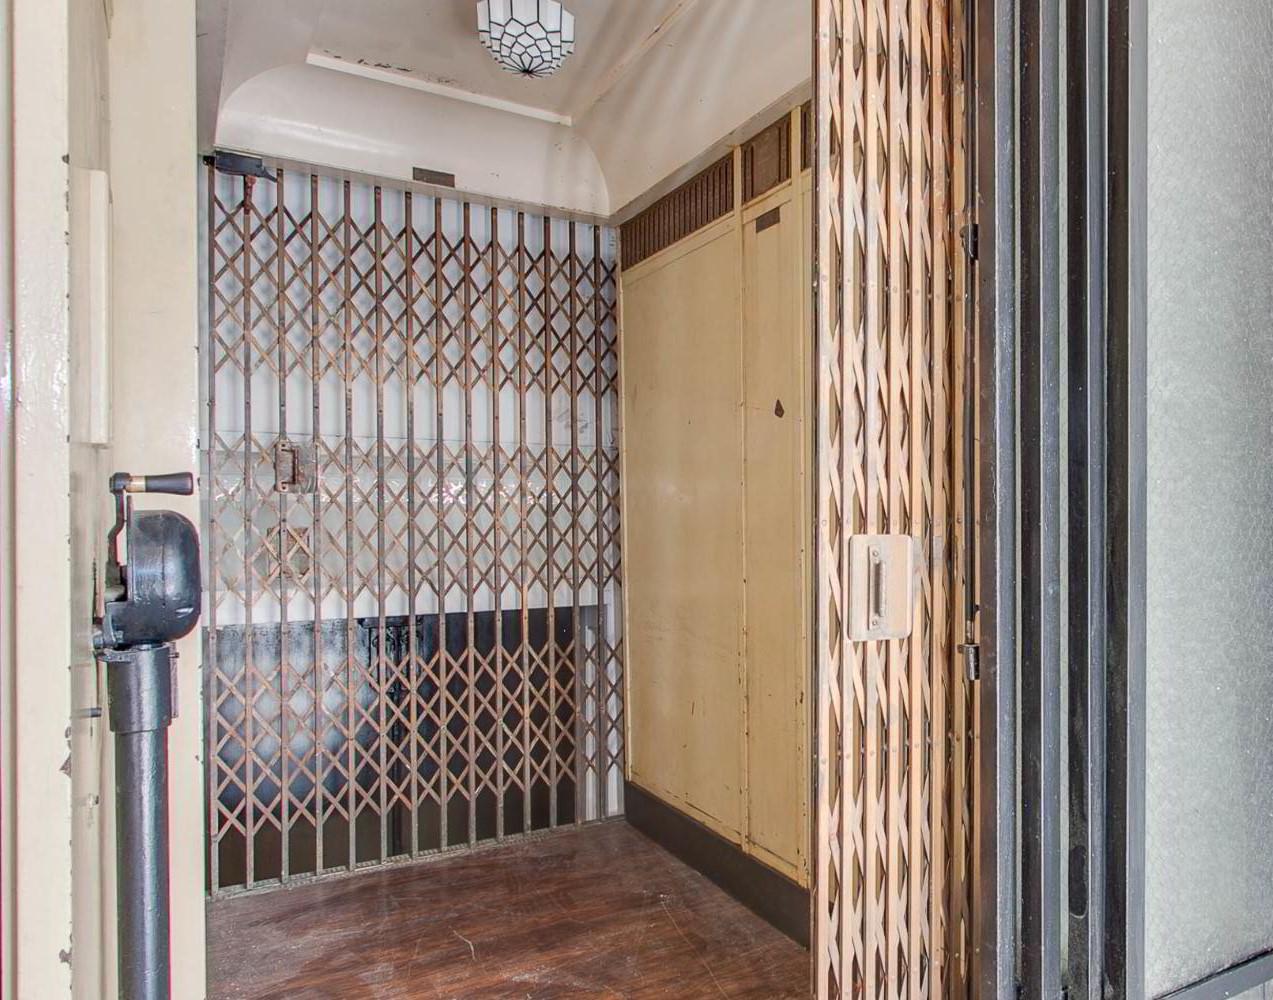 elijah otis elevators Otis: a visual timeline home: about otis: otis news: global otis in the community ã'â©2016 otis elevator company.